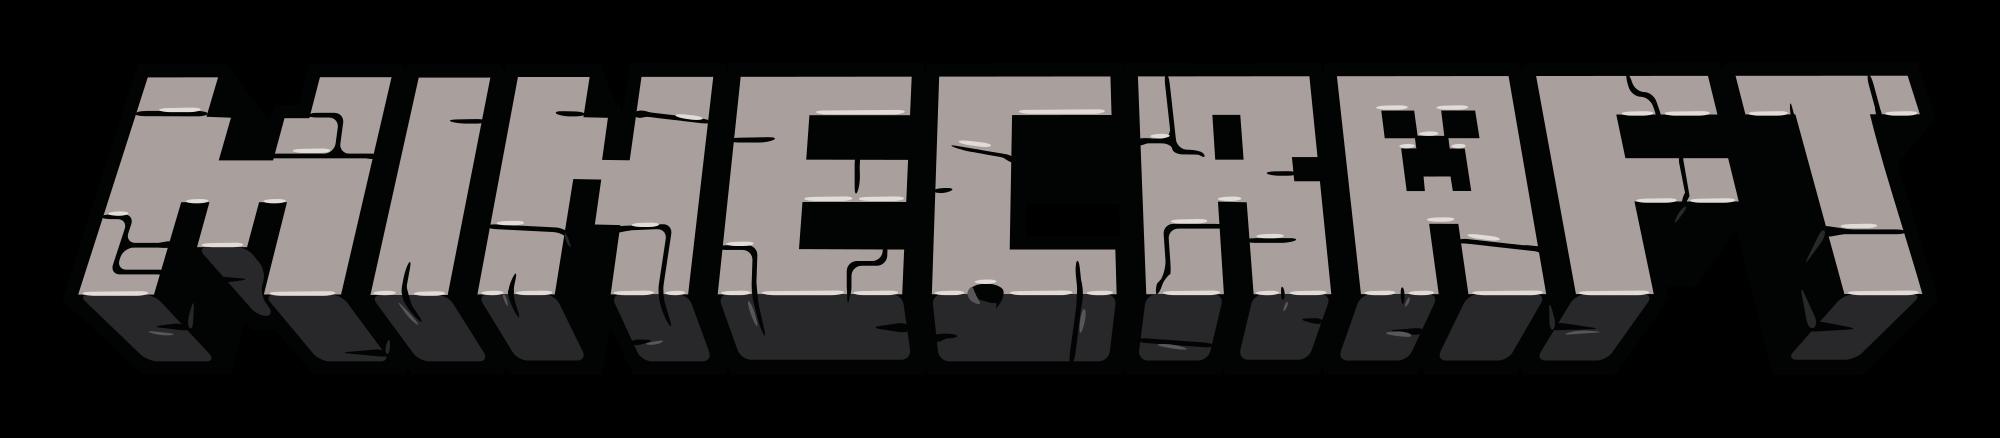 Download Minecraft Server Erstellen Anleitung Deutsch Hamachi - Minecraft server erstellen hamachi anleitung